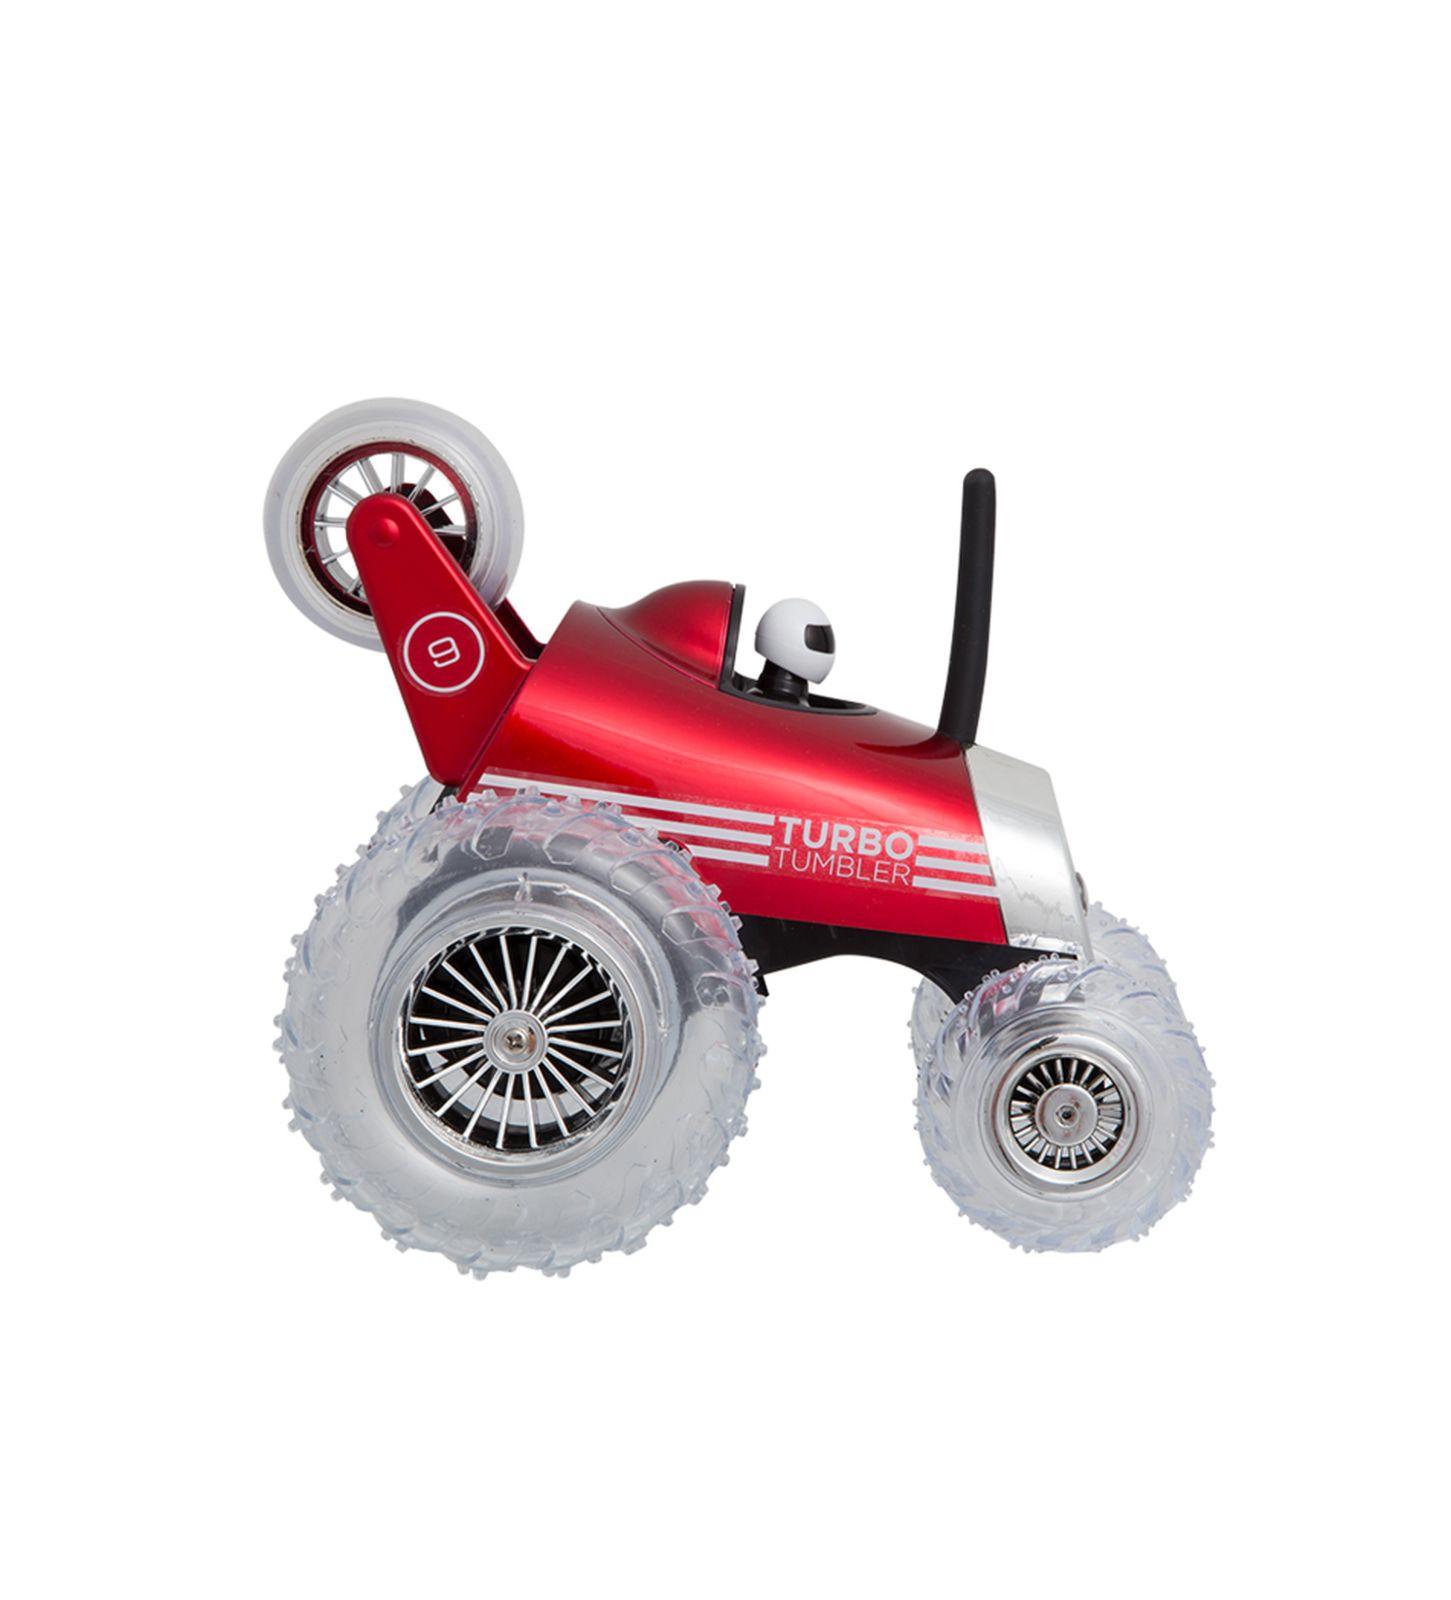 Auto r/c monster tumbler - SHARPER IMAGES